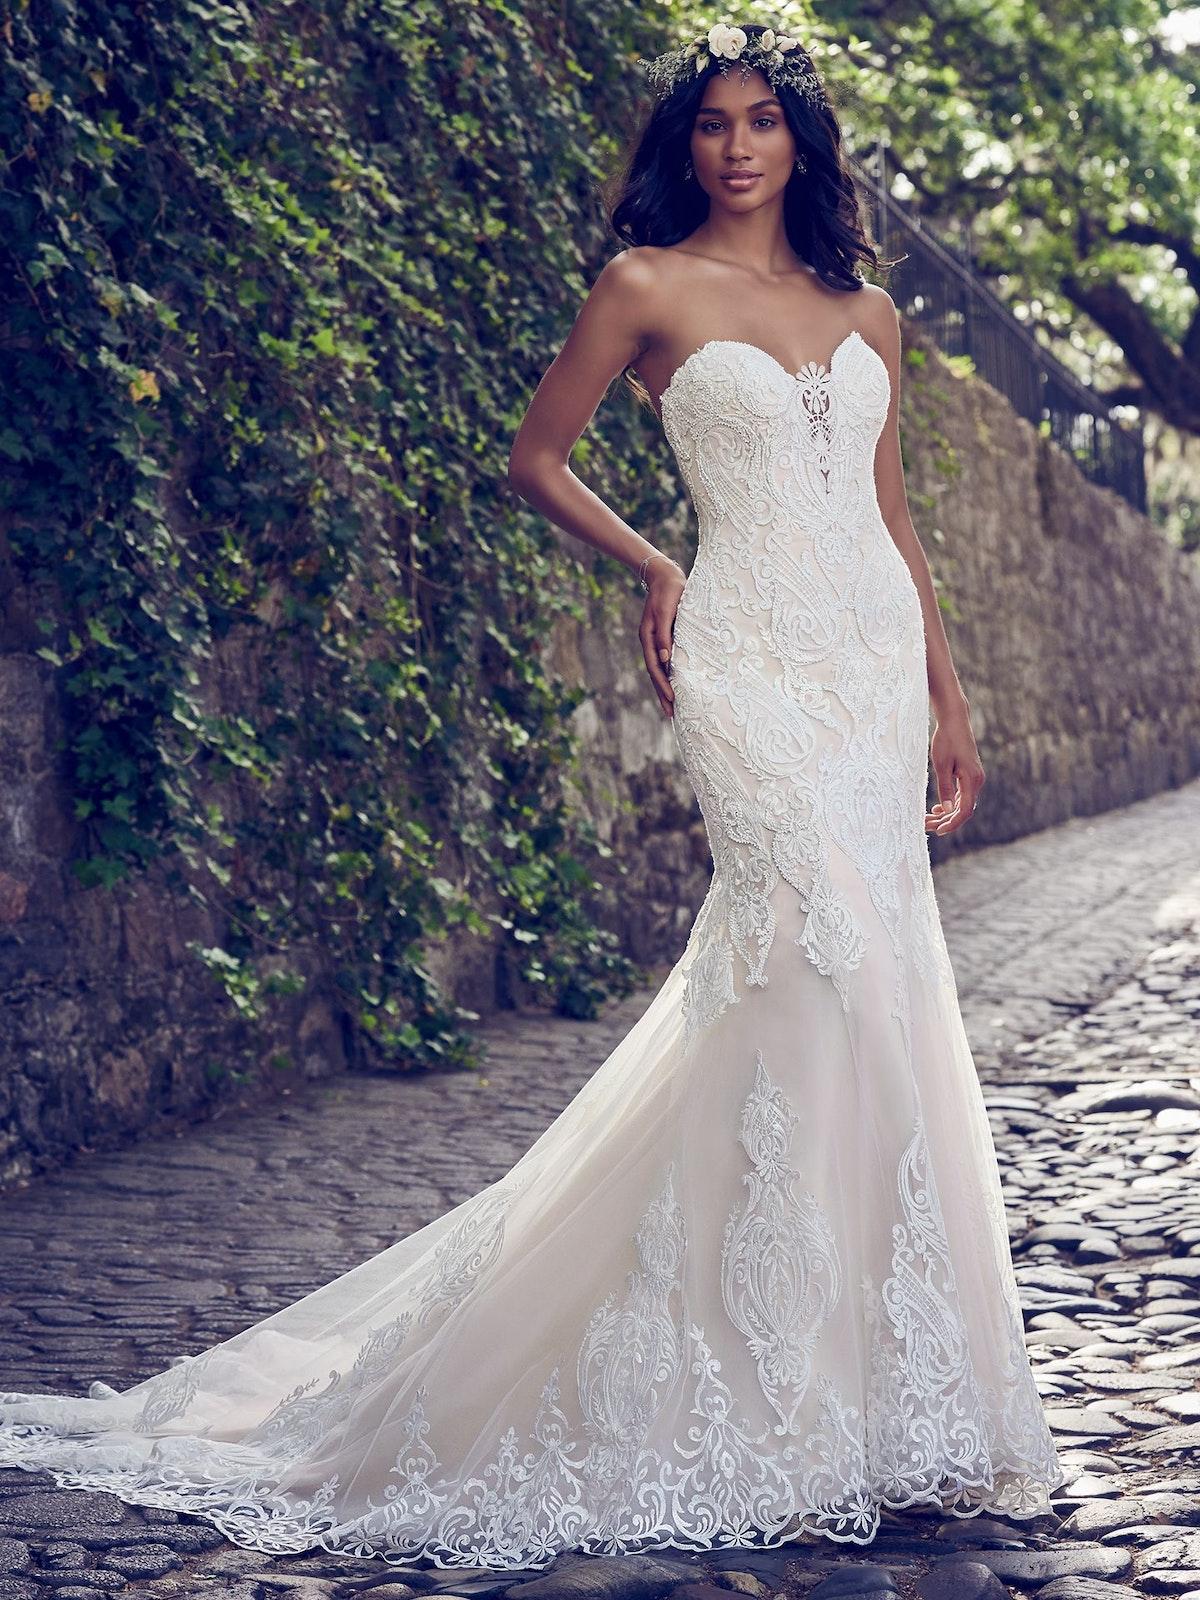 Autumn (8MS562) Princess Wedding Dress by Maggie Sottero